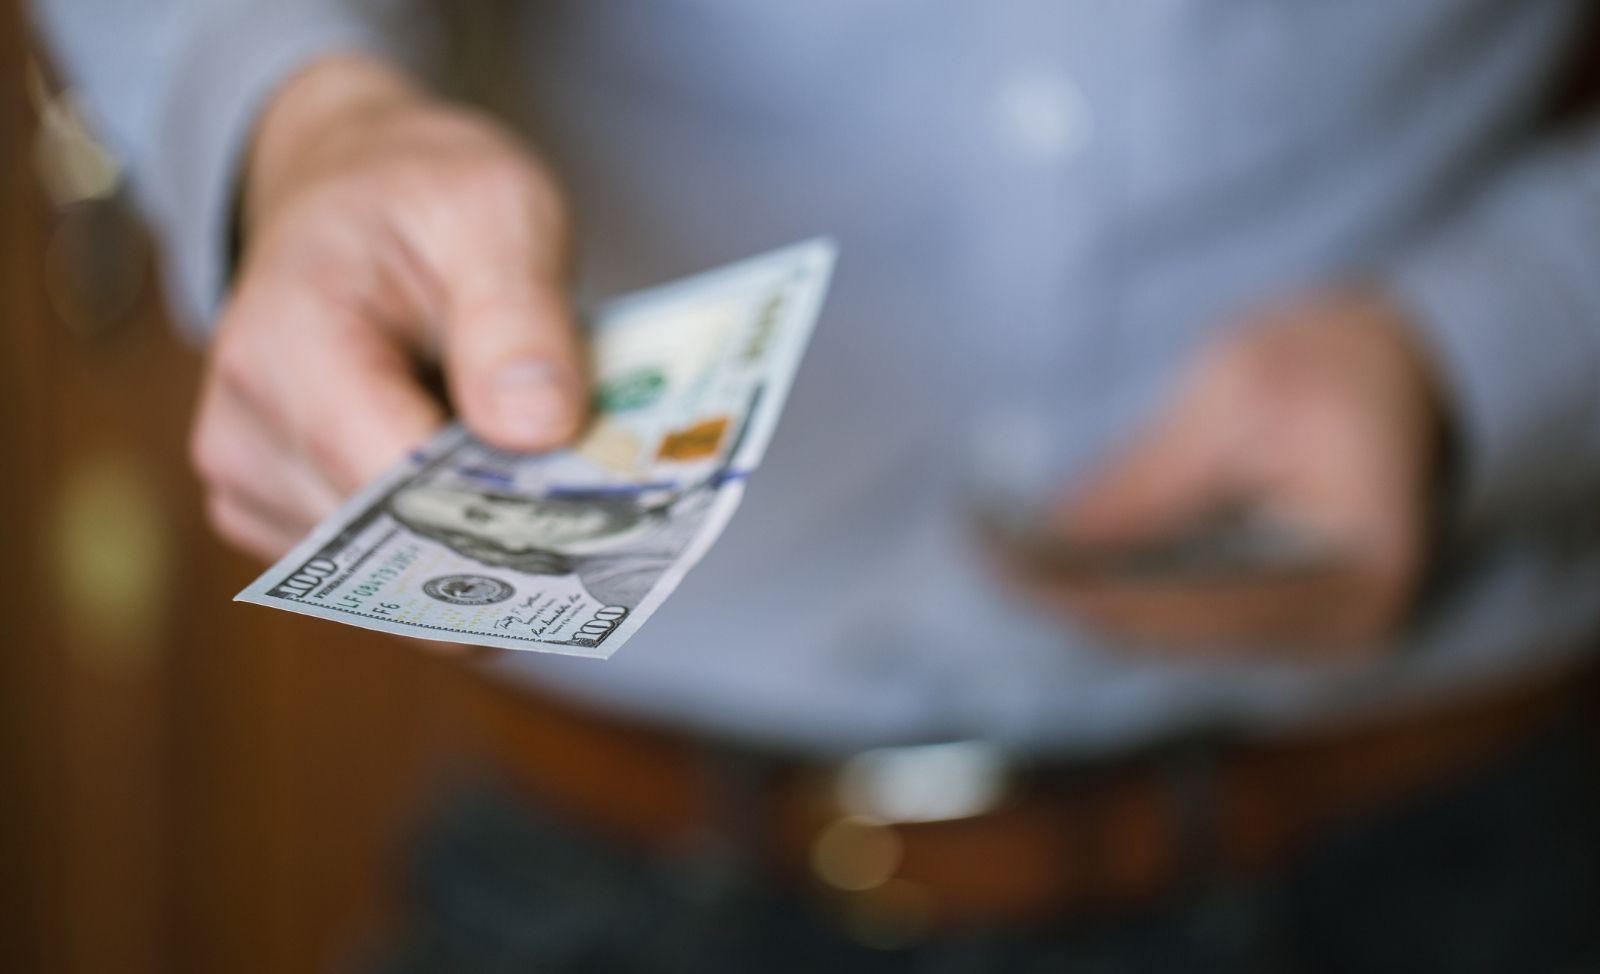 man handing over a one hundred dollar bill